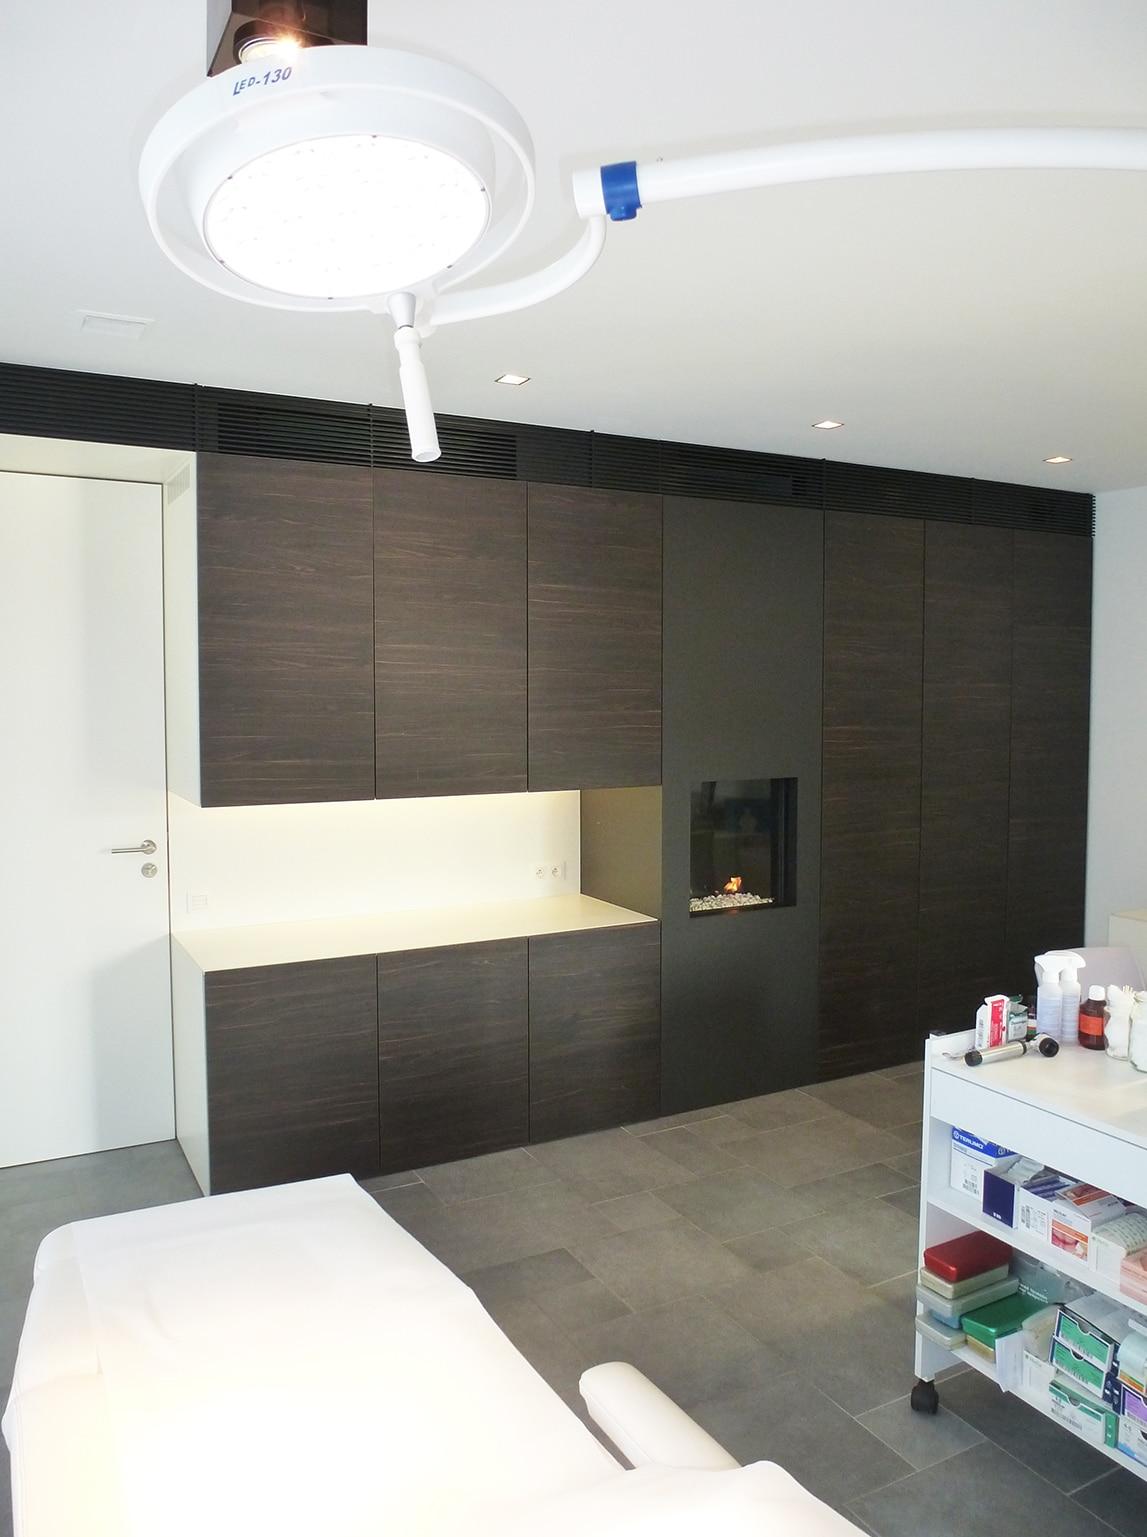 kbp2 | Baeyens & Beck architecten Gent | architect nieuwbouw renovatie interieur | high end | architectenbureau